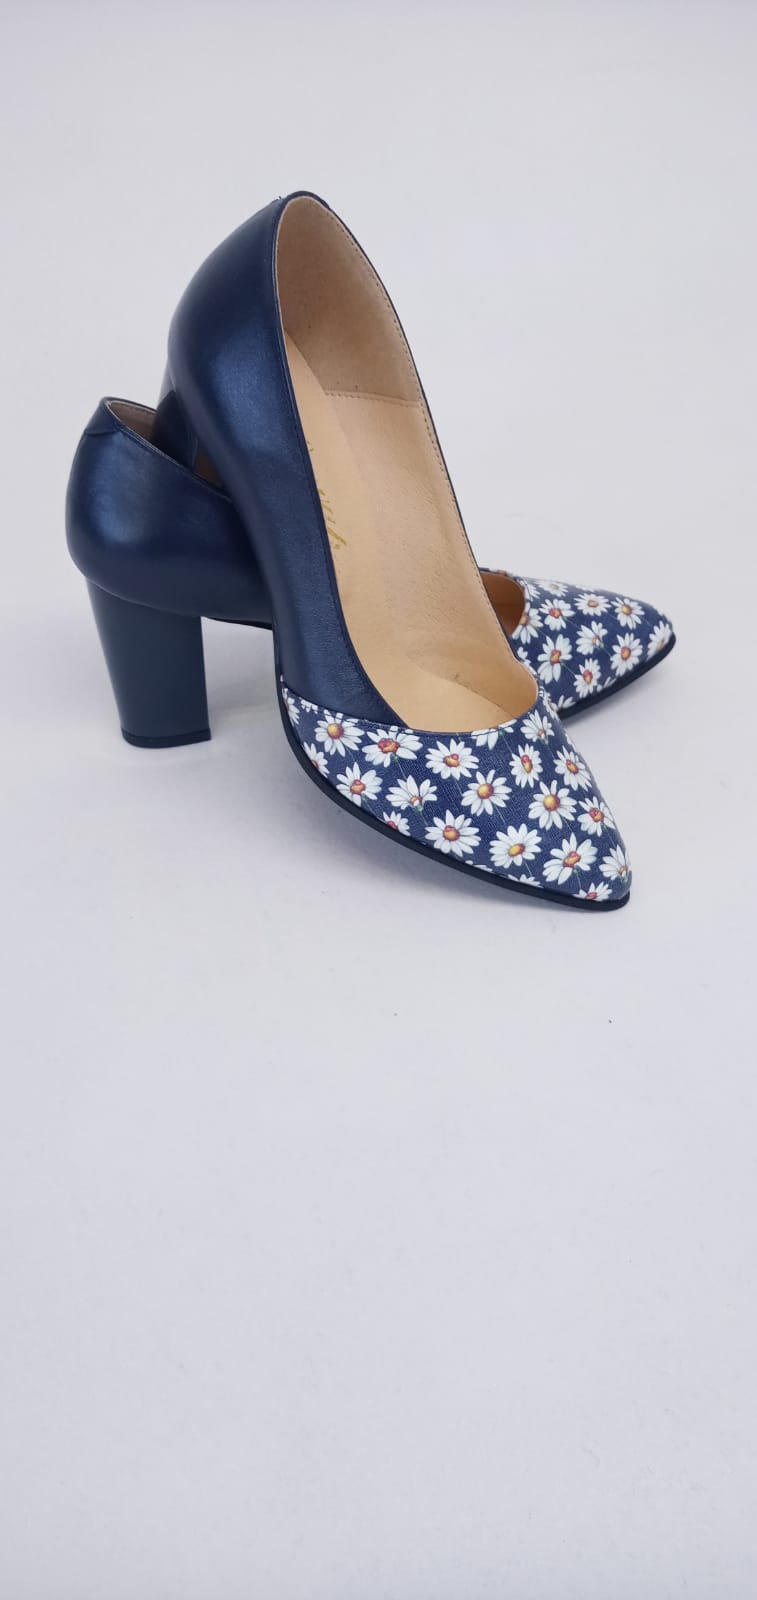 Pantofi albastri din piele nautrala cu imprimeu floral